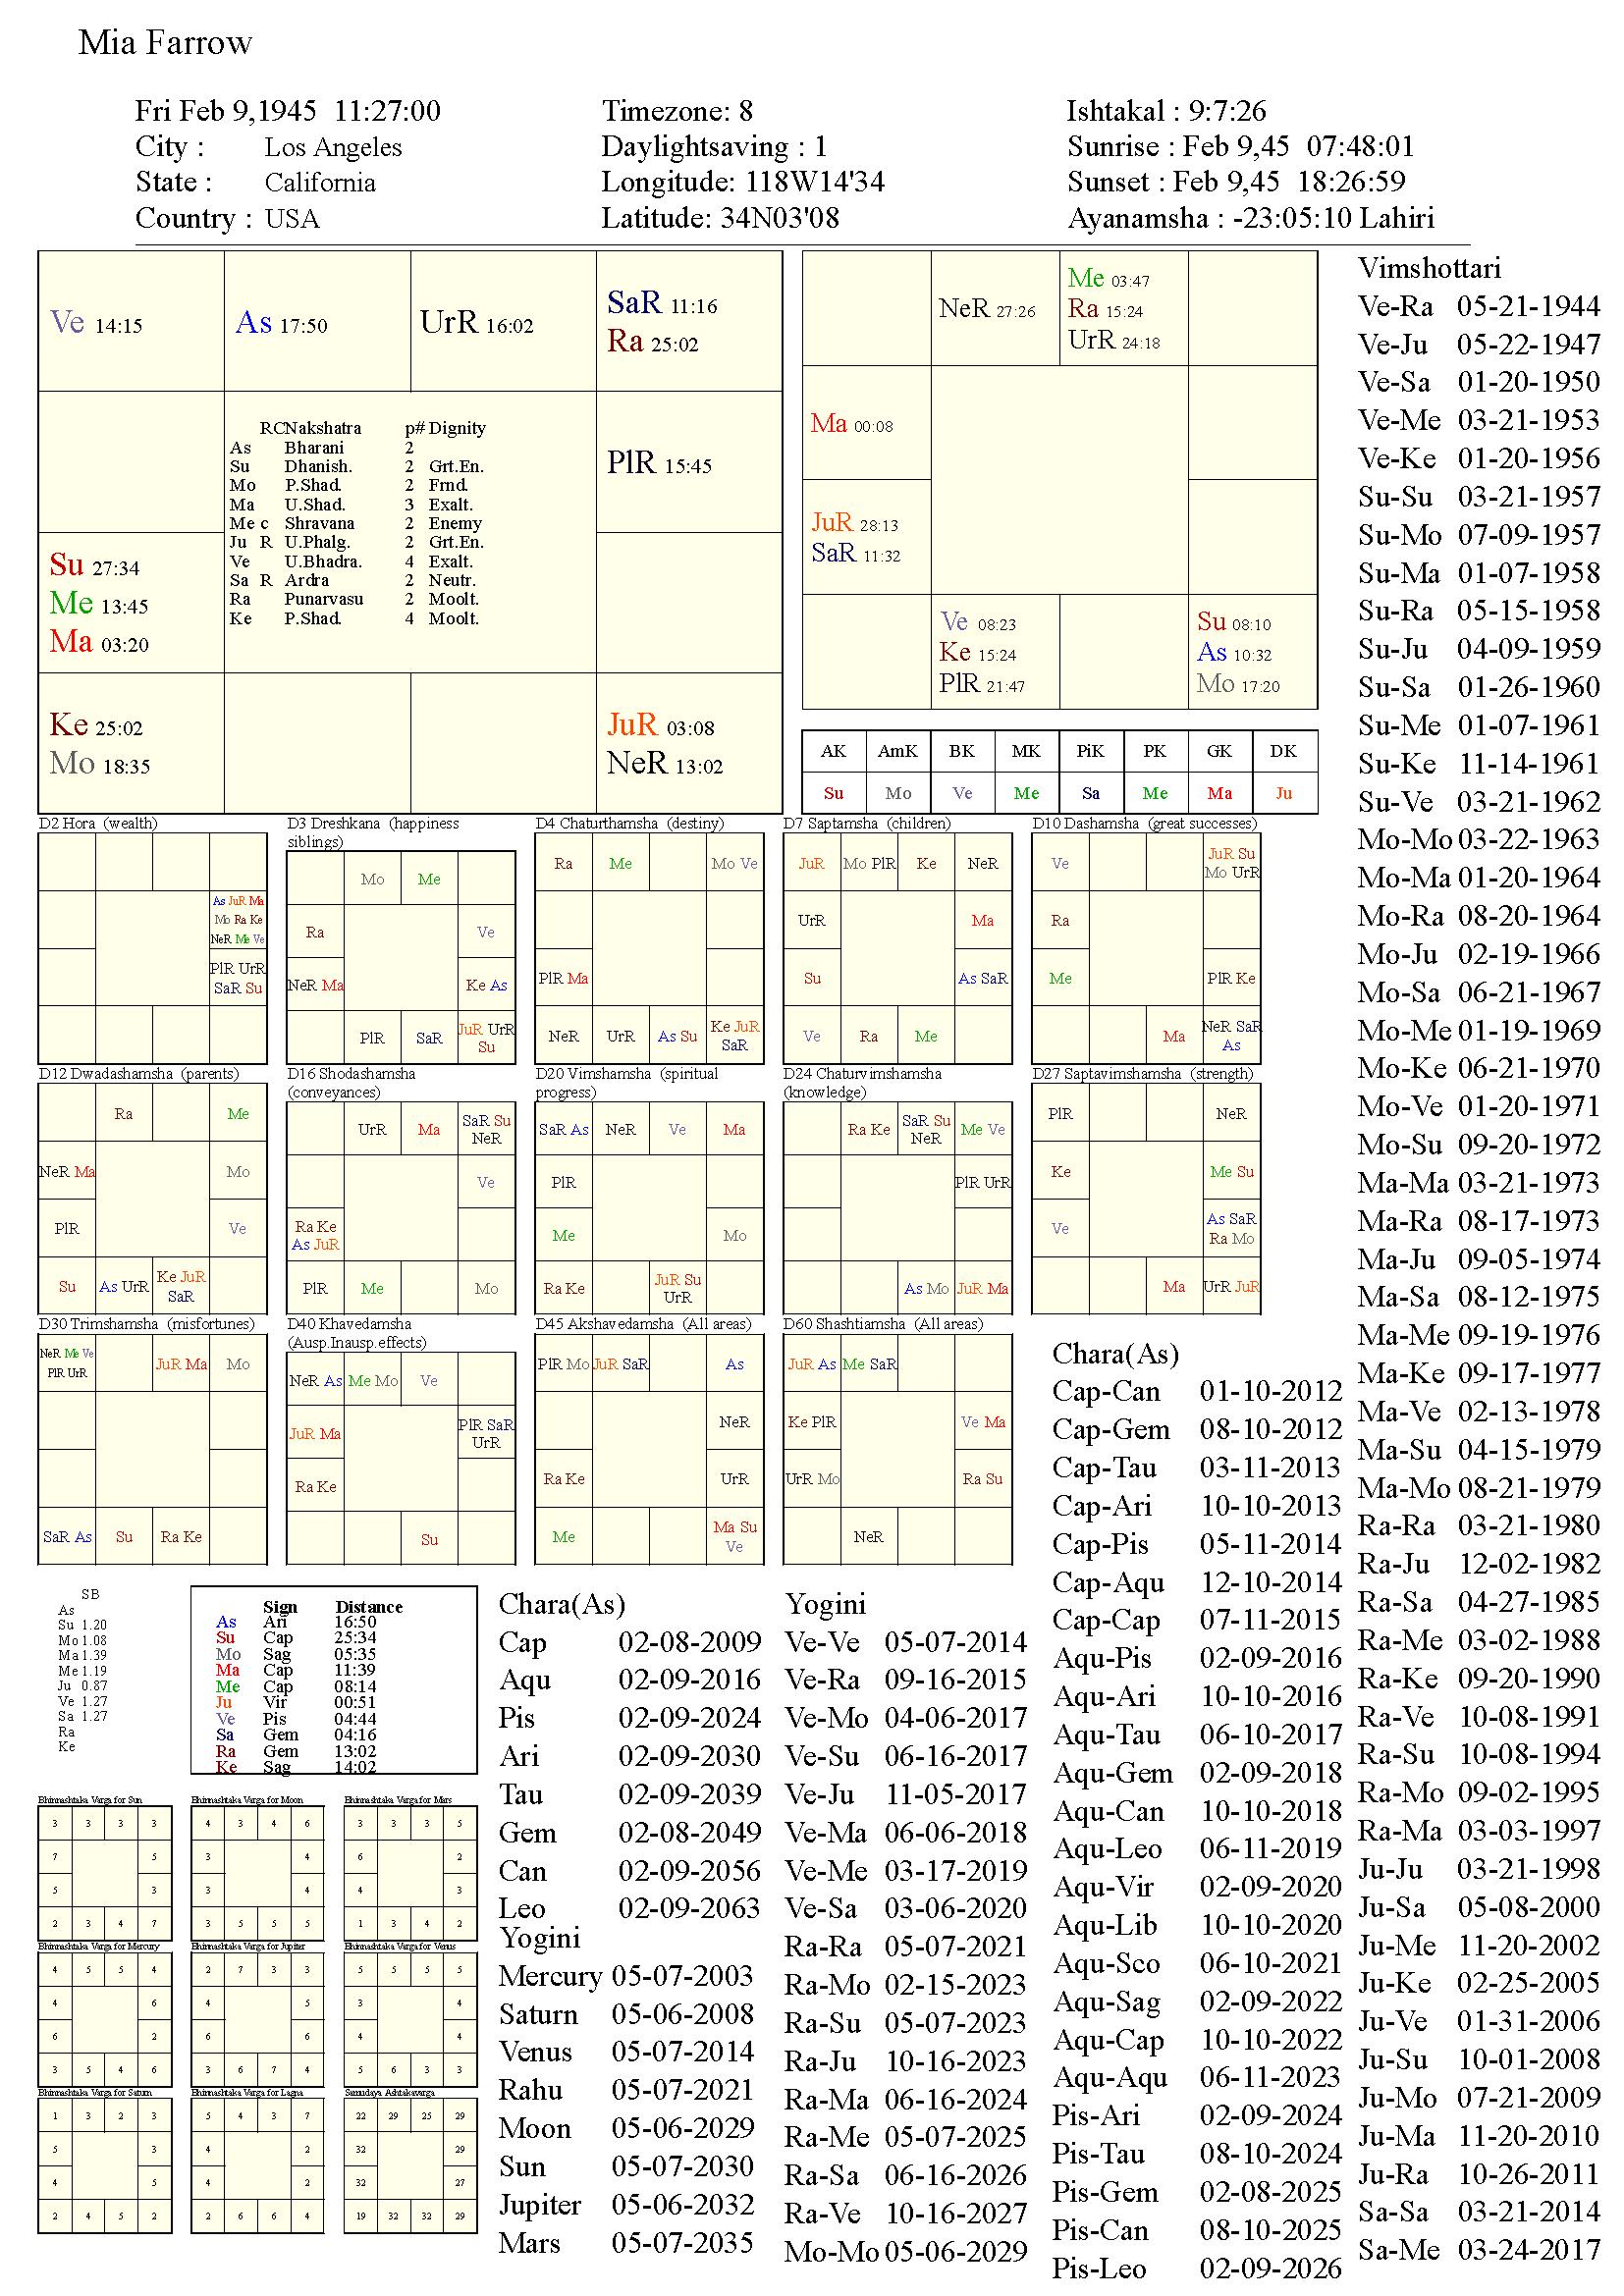 MiaFarrow_chart